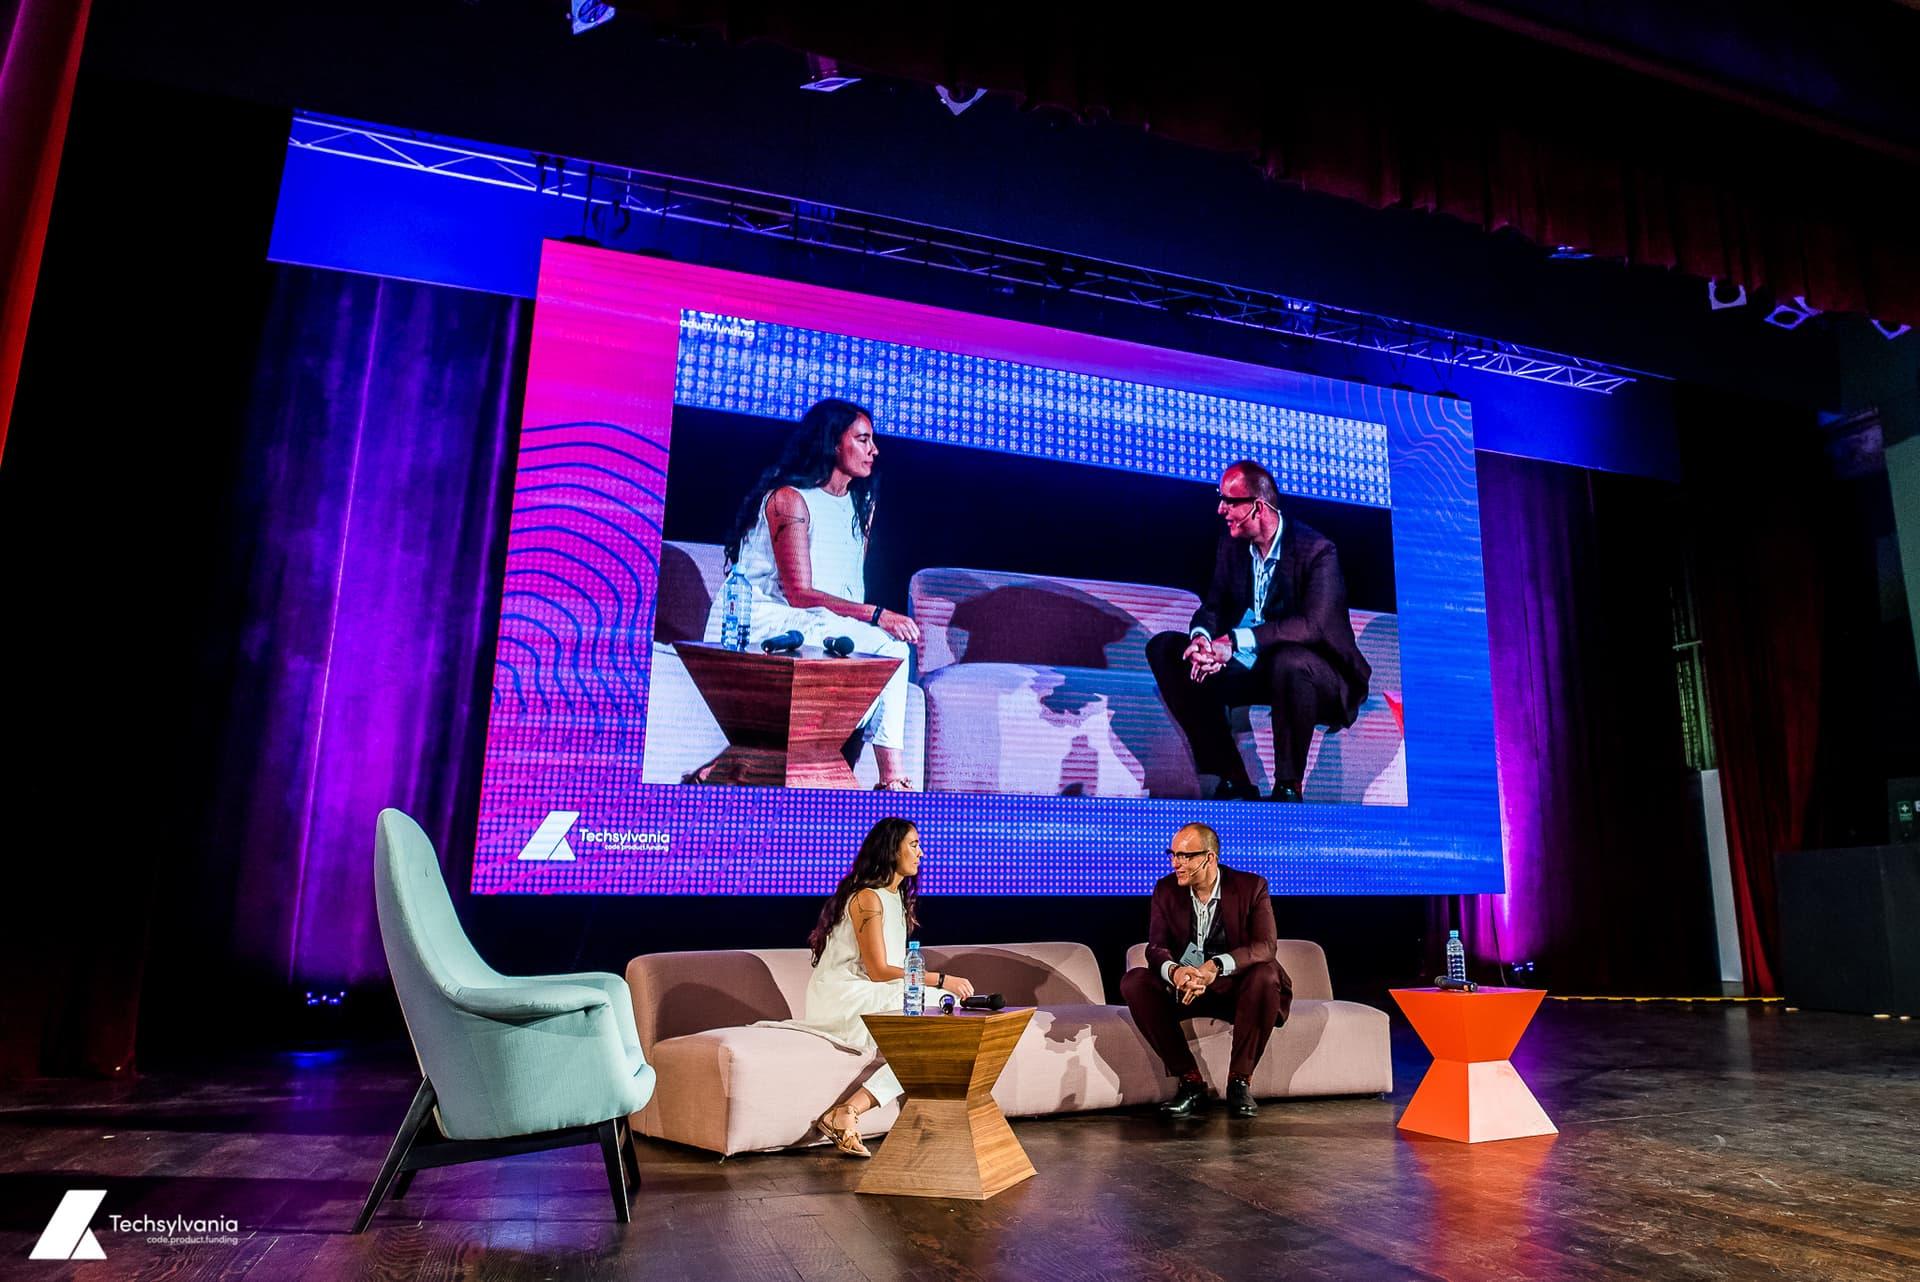 Techsylvania aduce în premieră în România oameni-cheie din companii precum Nike, BBC, Go-Jek și Softbank Vision Fund